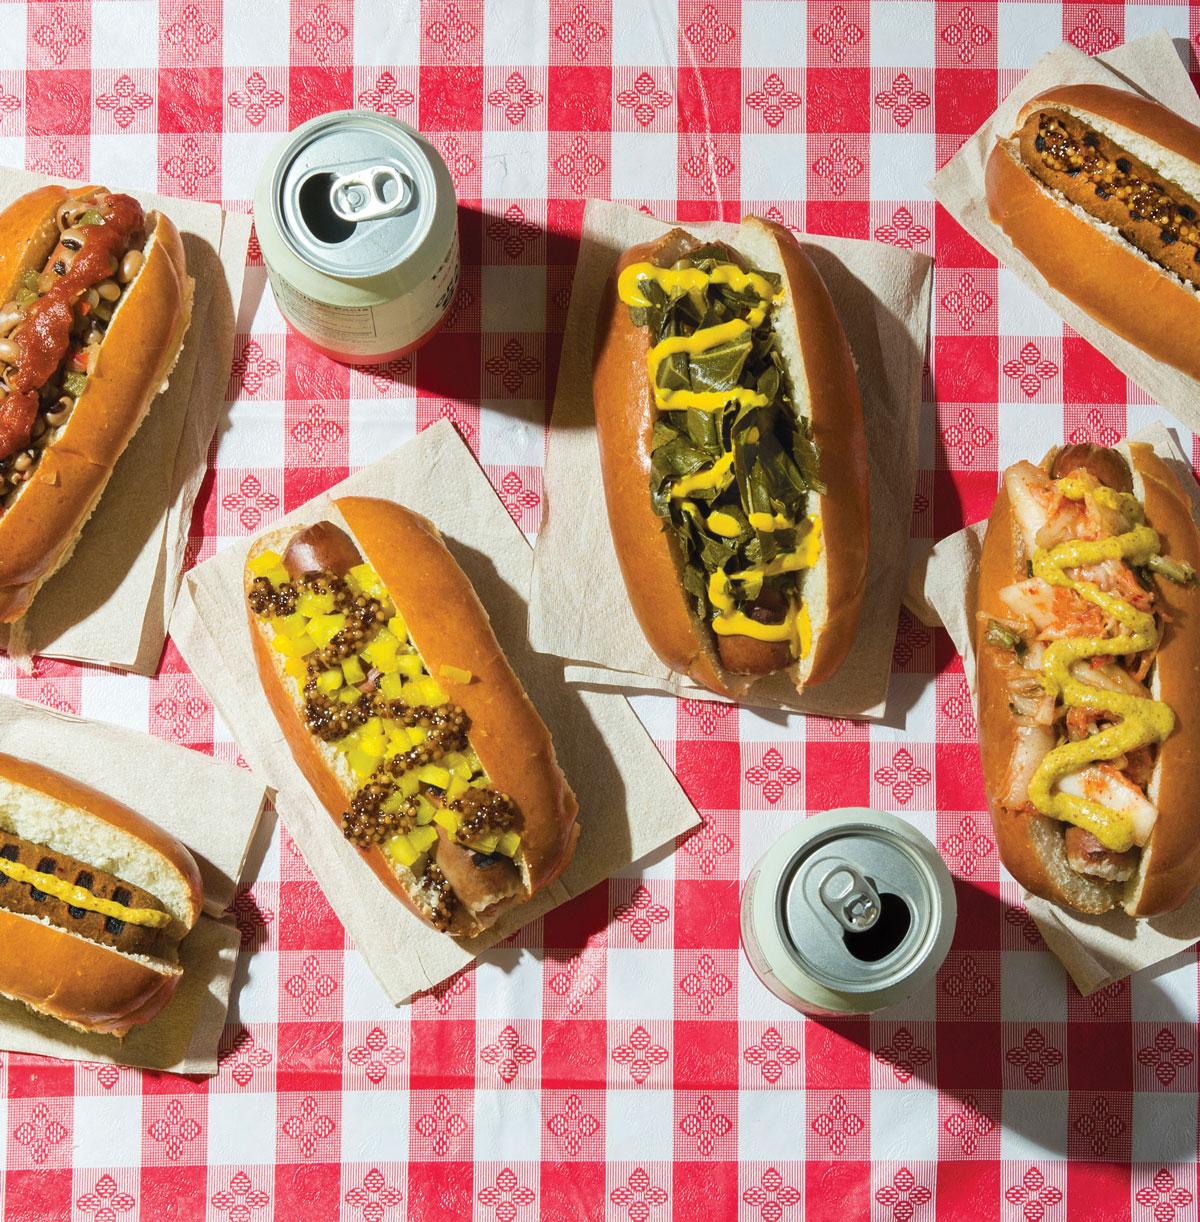 Hot Dog with Collard Greens